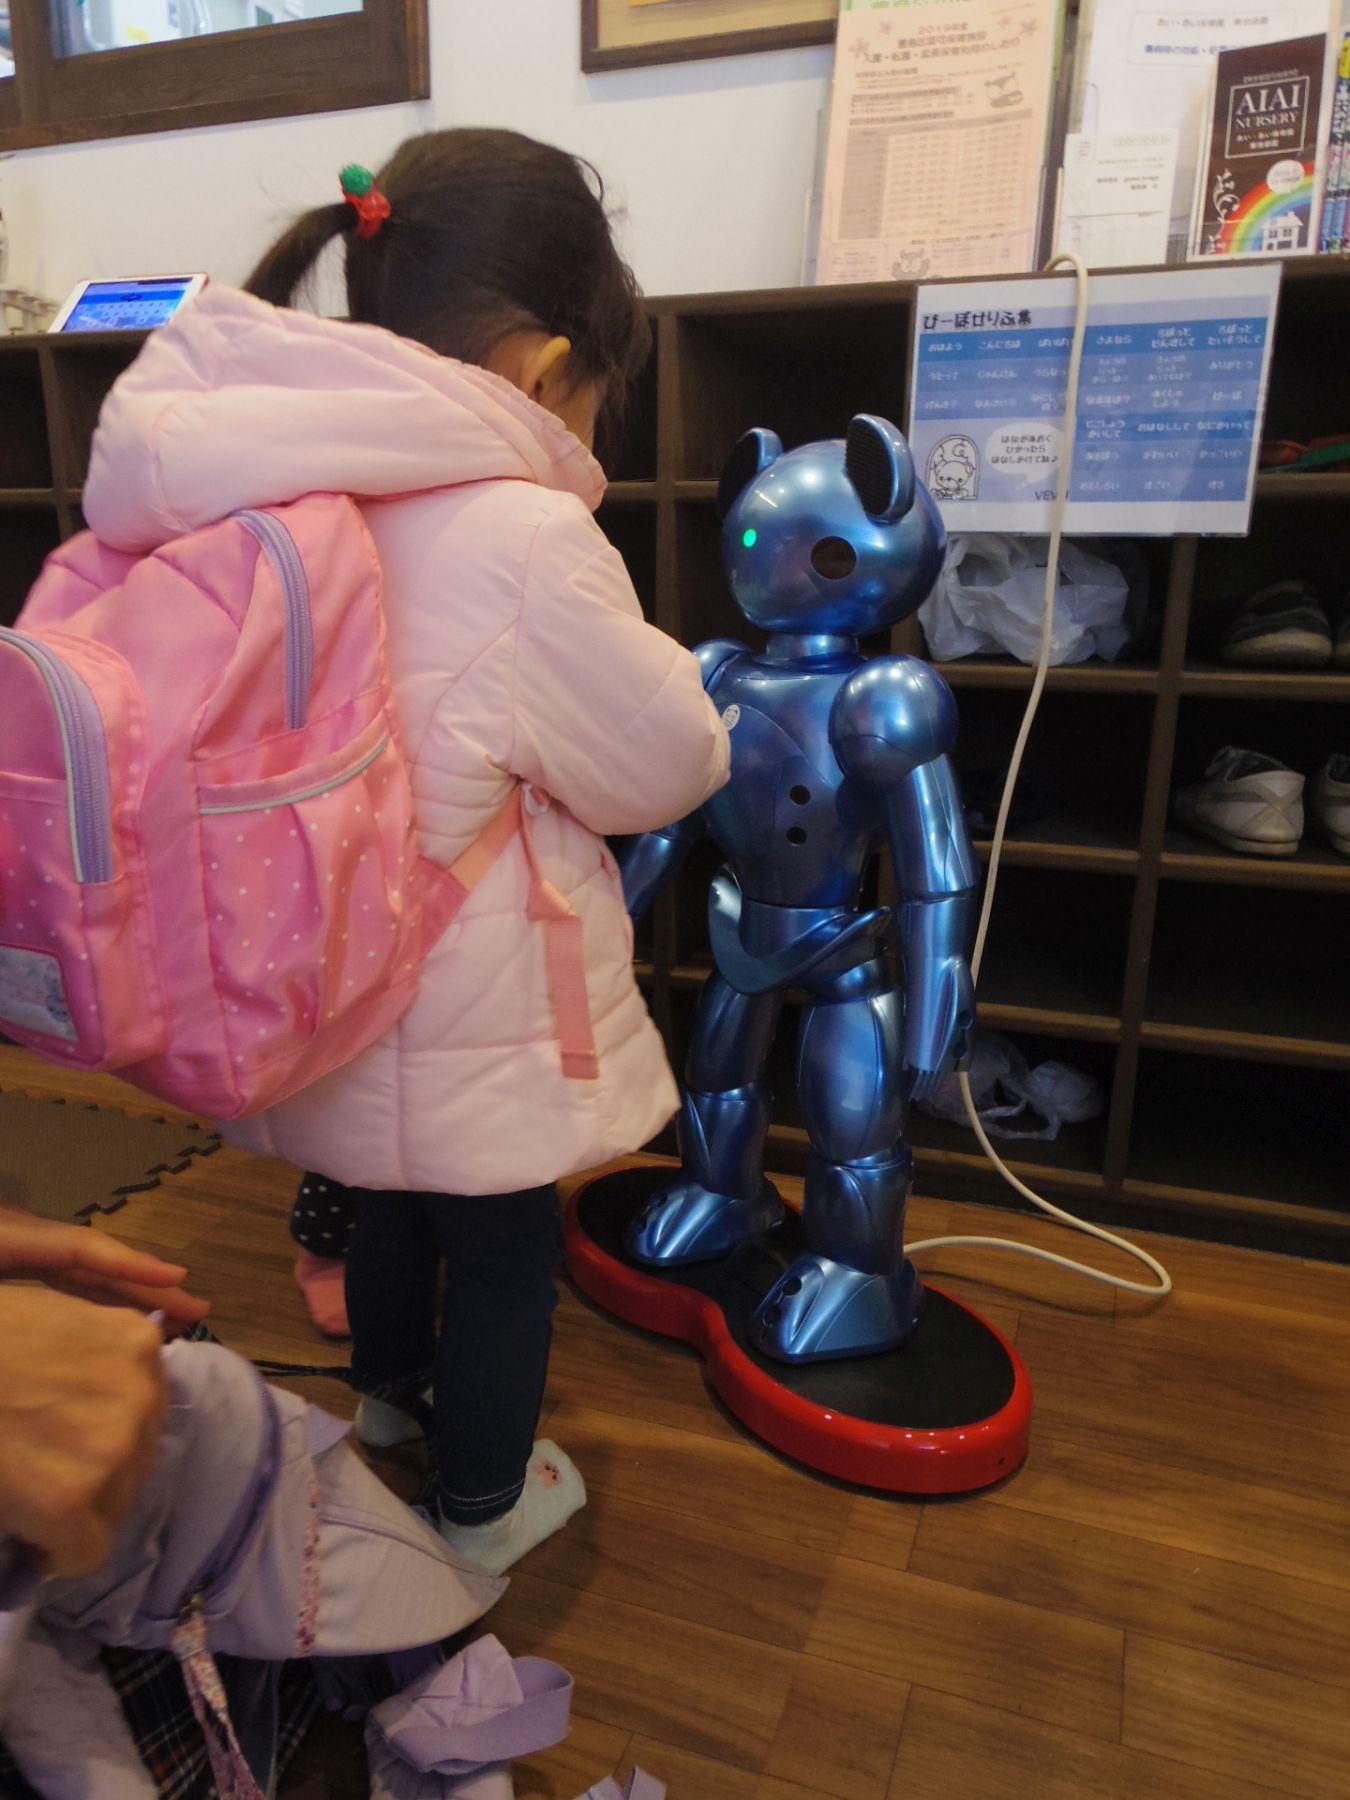 Japan Nursery School AI Robots 006